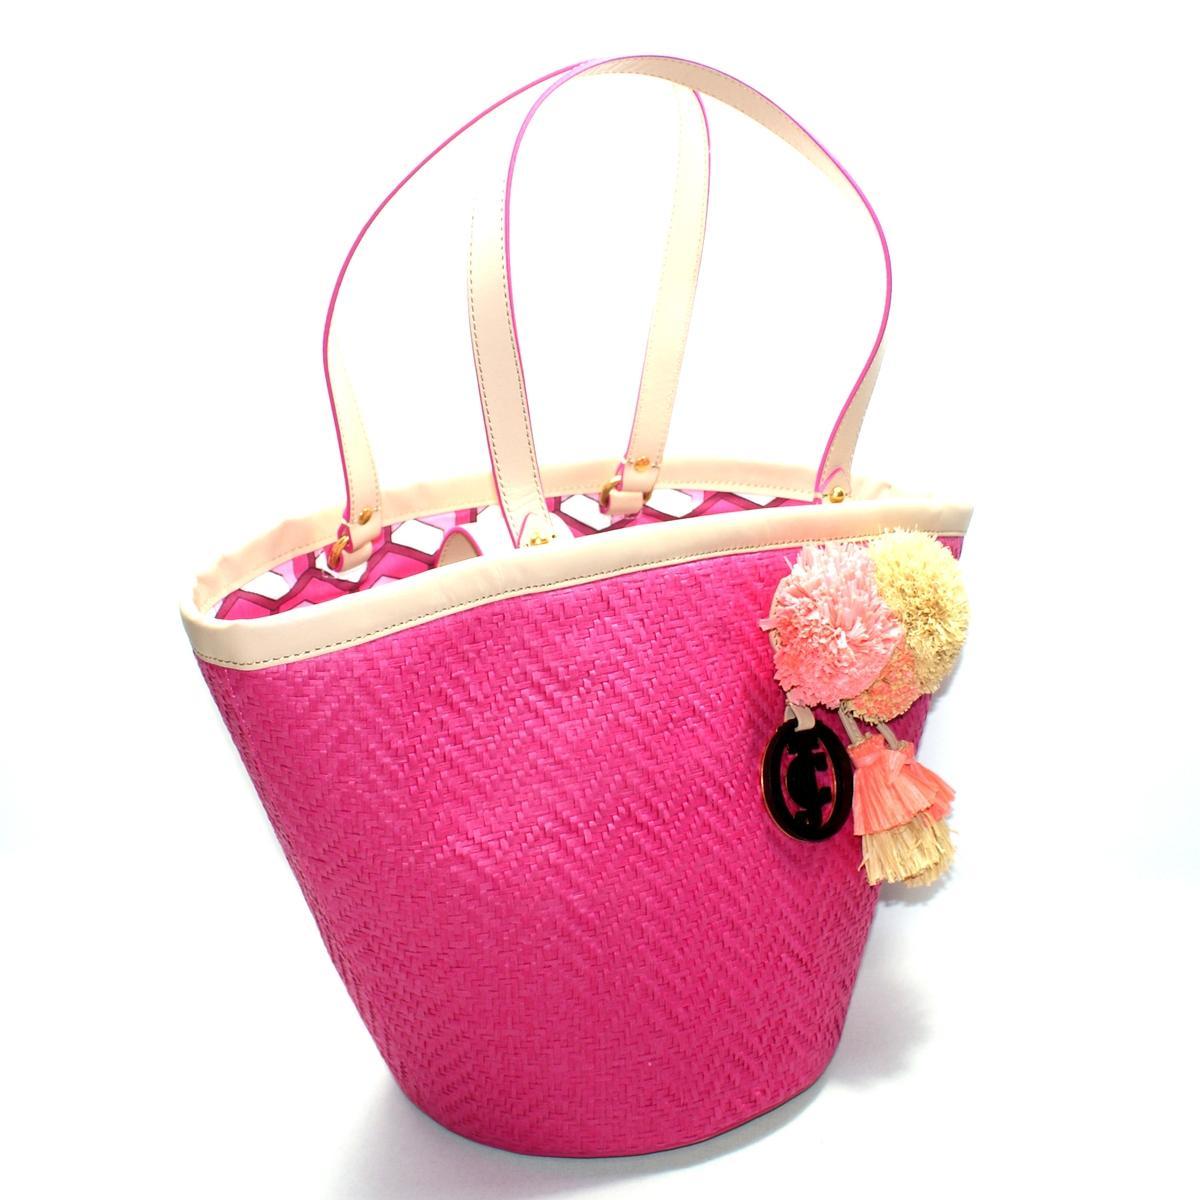 Juicy Couture Lynn The North Shore Straw Tote Bag #YHRU2918 : Juicy ...